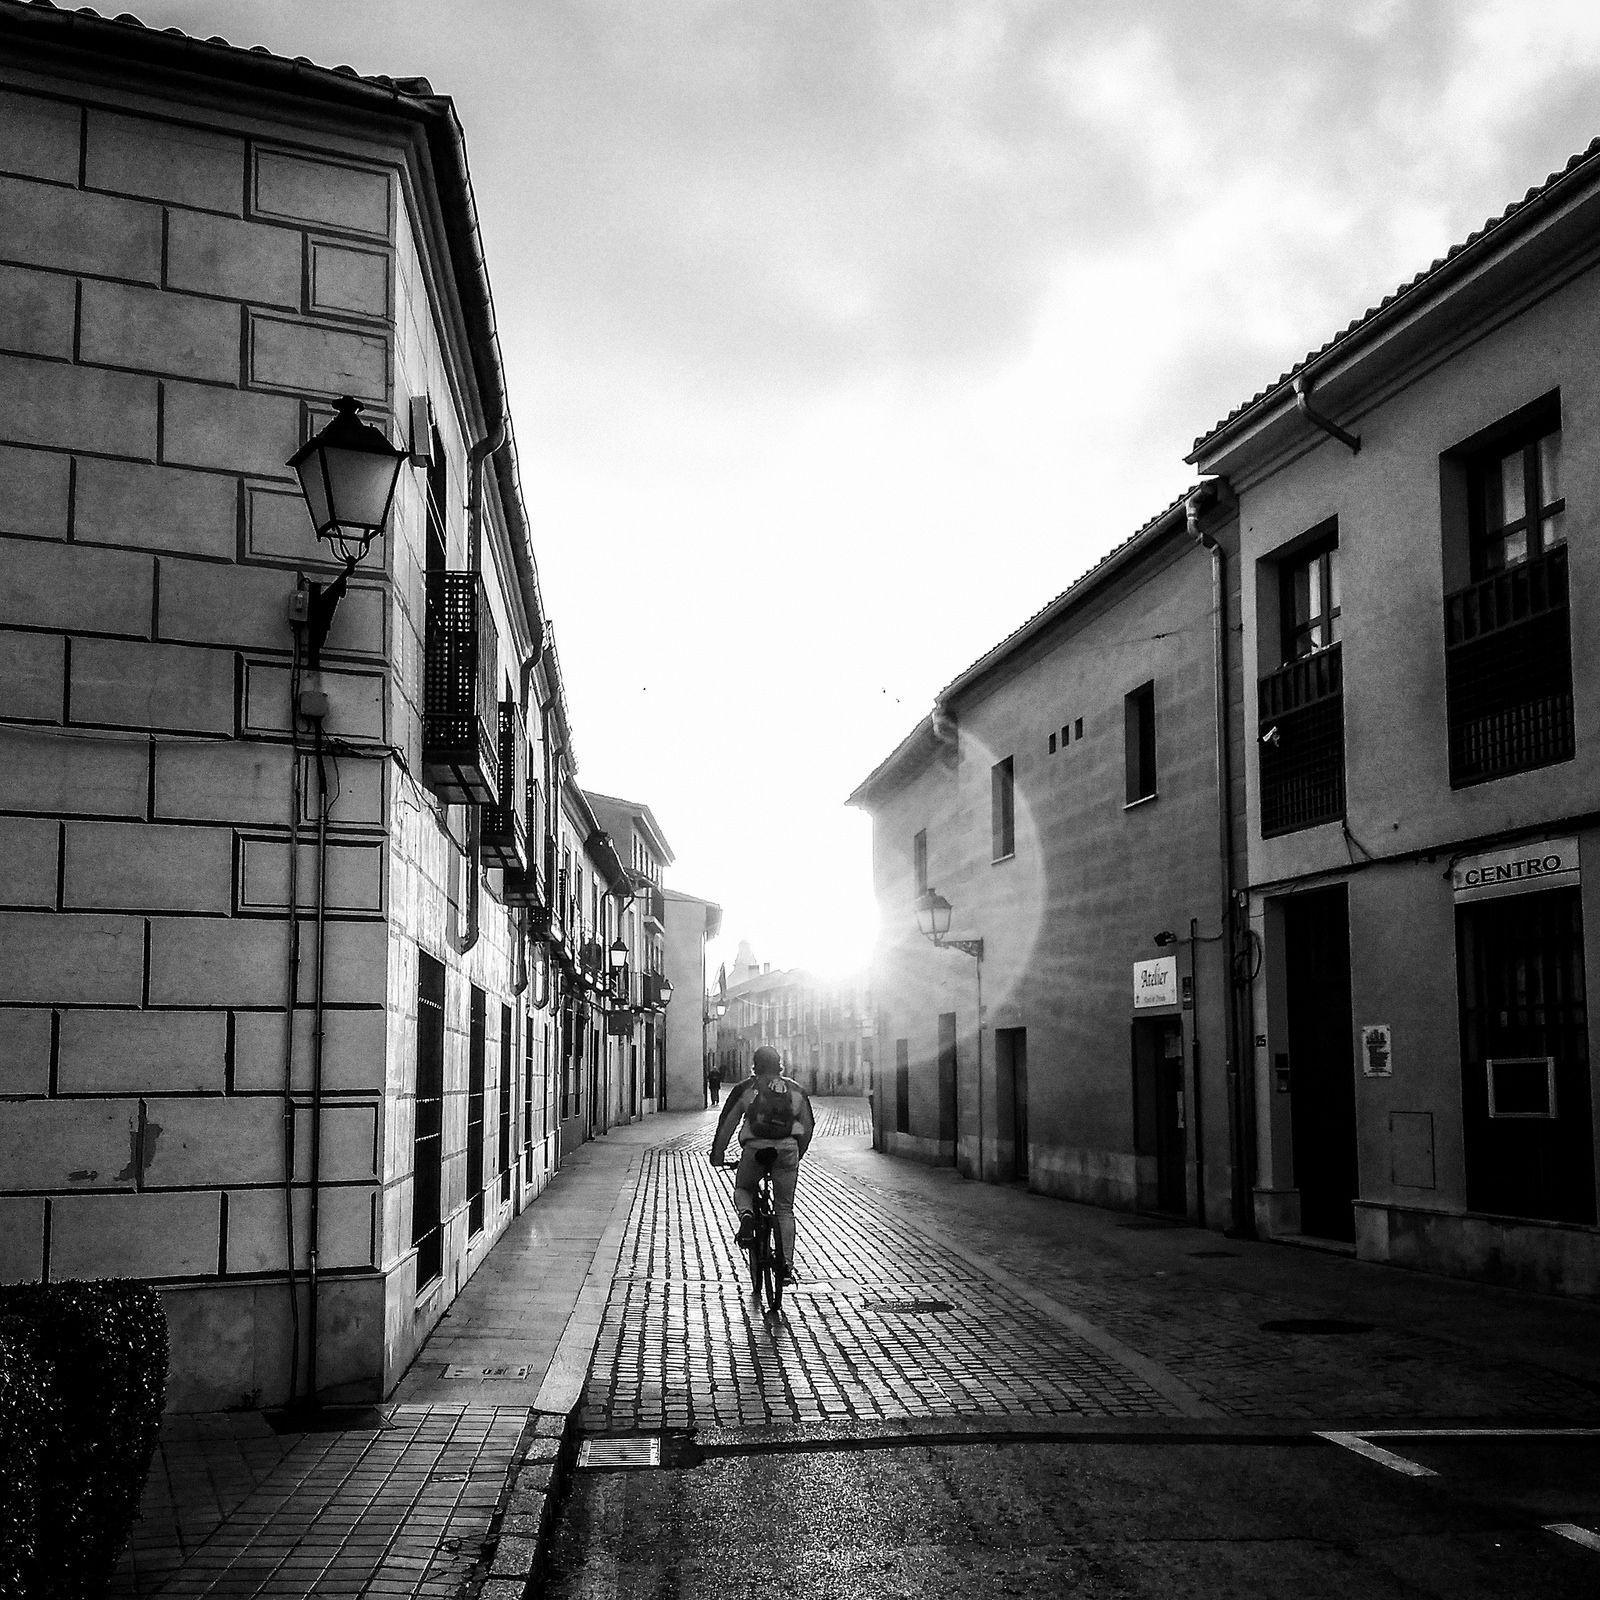 https://flic.kr/p/SbQ4Re | Viaje a la luz | unaciertamirada.com         © All rights reserved. Do not use without written permission from photographer.         YELLOWKORNER  Instagram / Facebook / Twitter / 500px / Huffingtonpost Blog LRM_20170328_082922-Editar